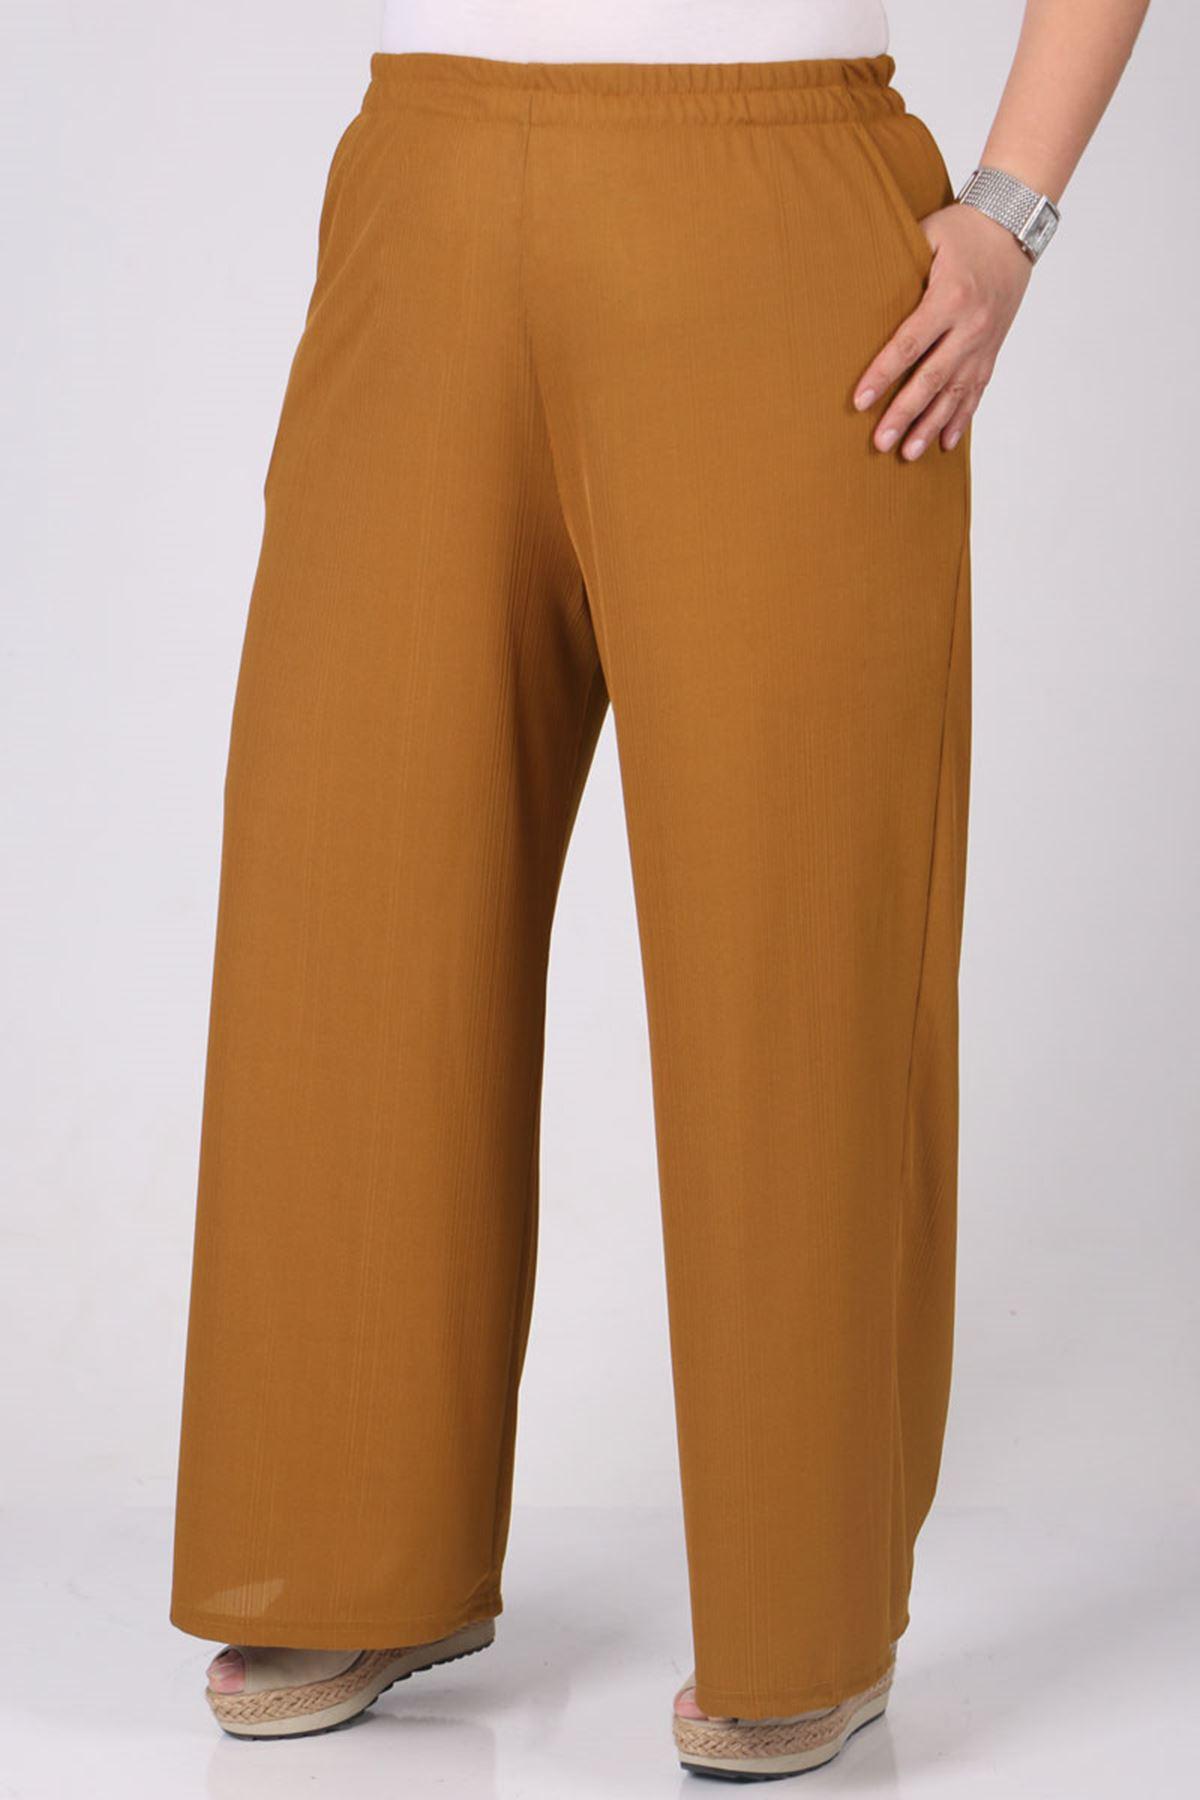 9163 Plus Size Elastic Waist Pants - Mustard